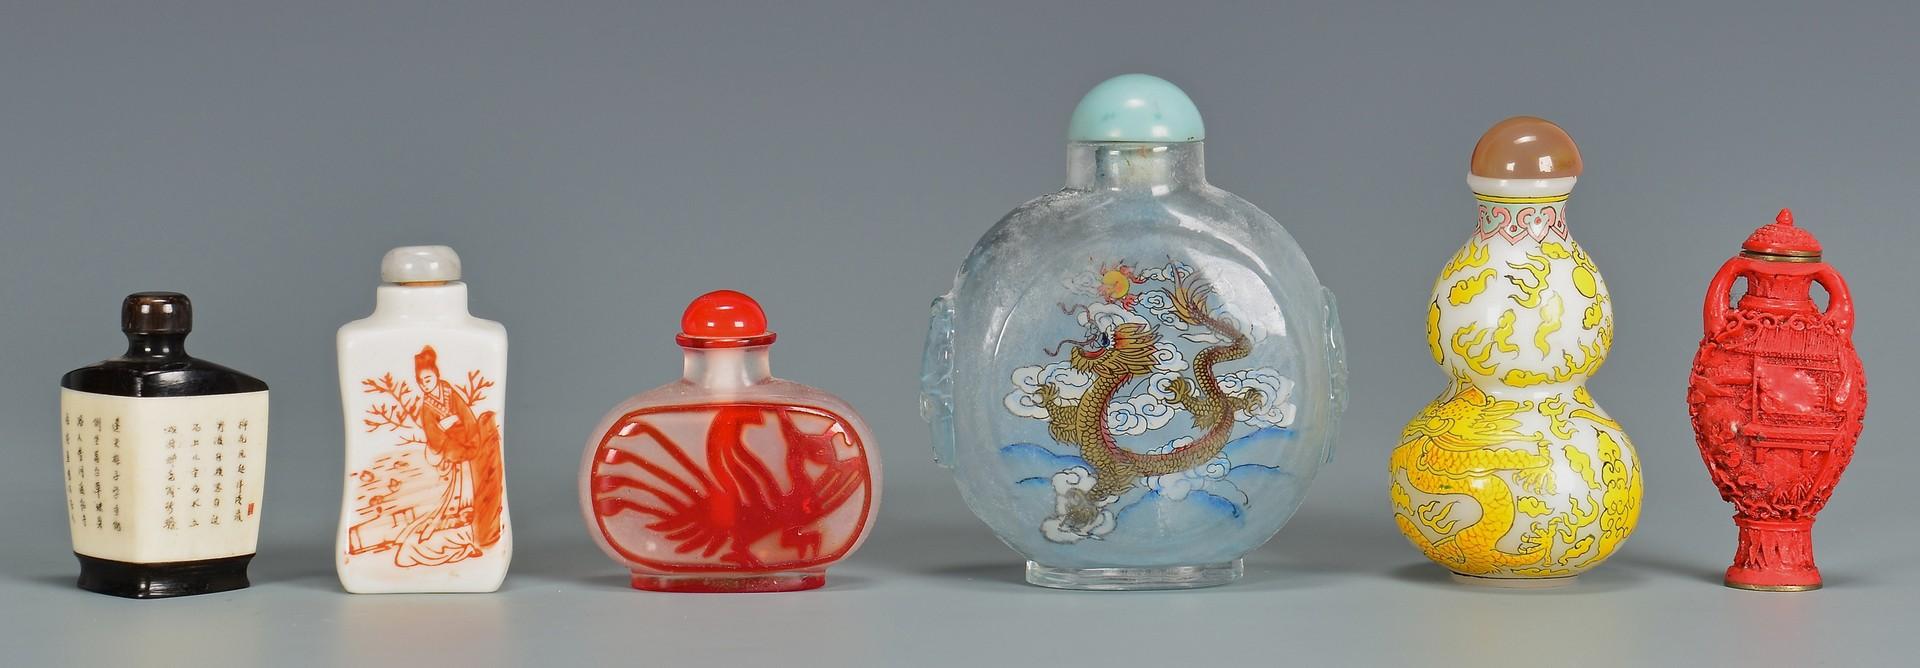 Lot 4010184: 6 assorted Asian snuff bottles